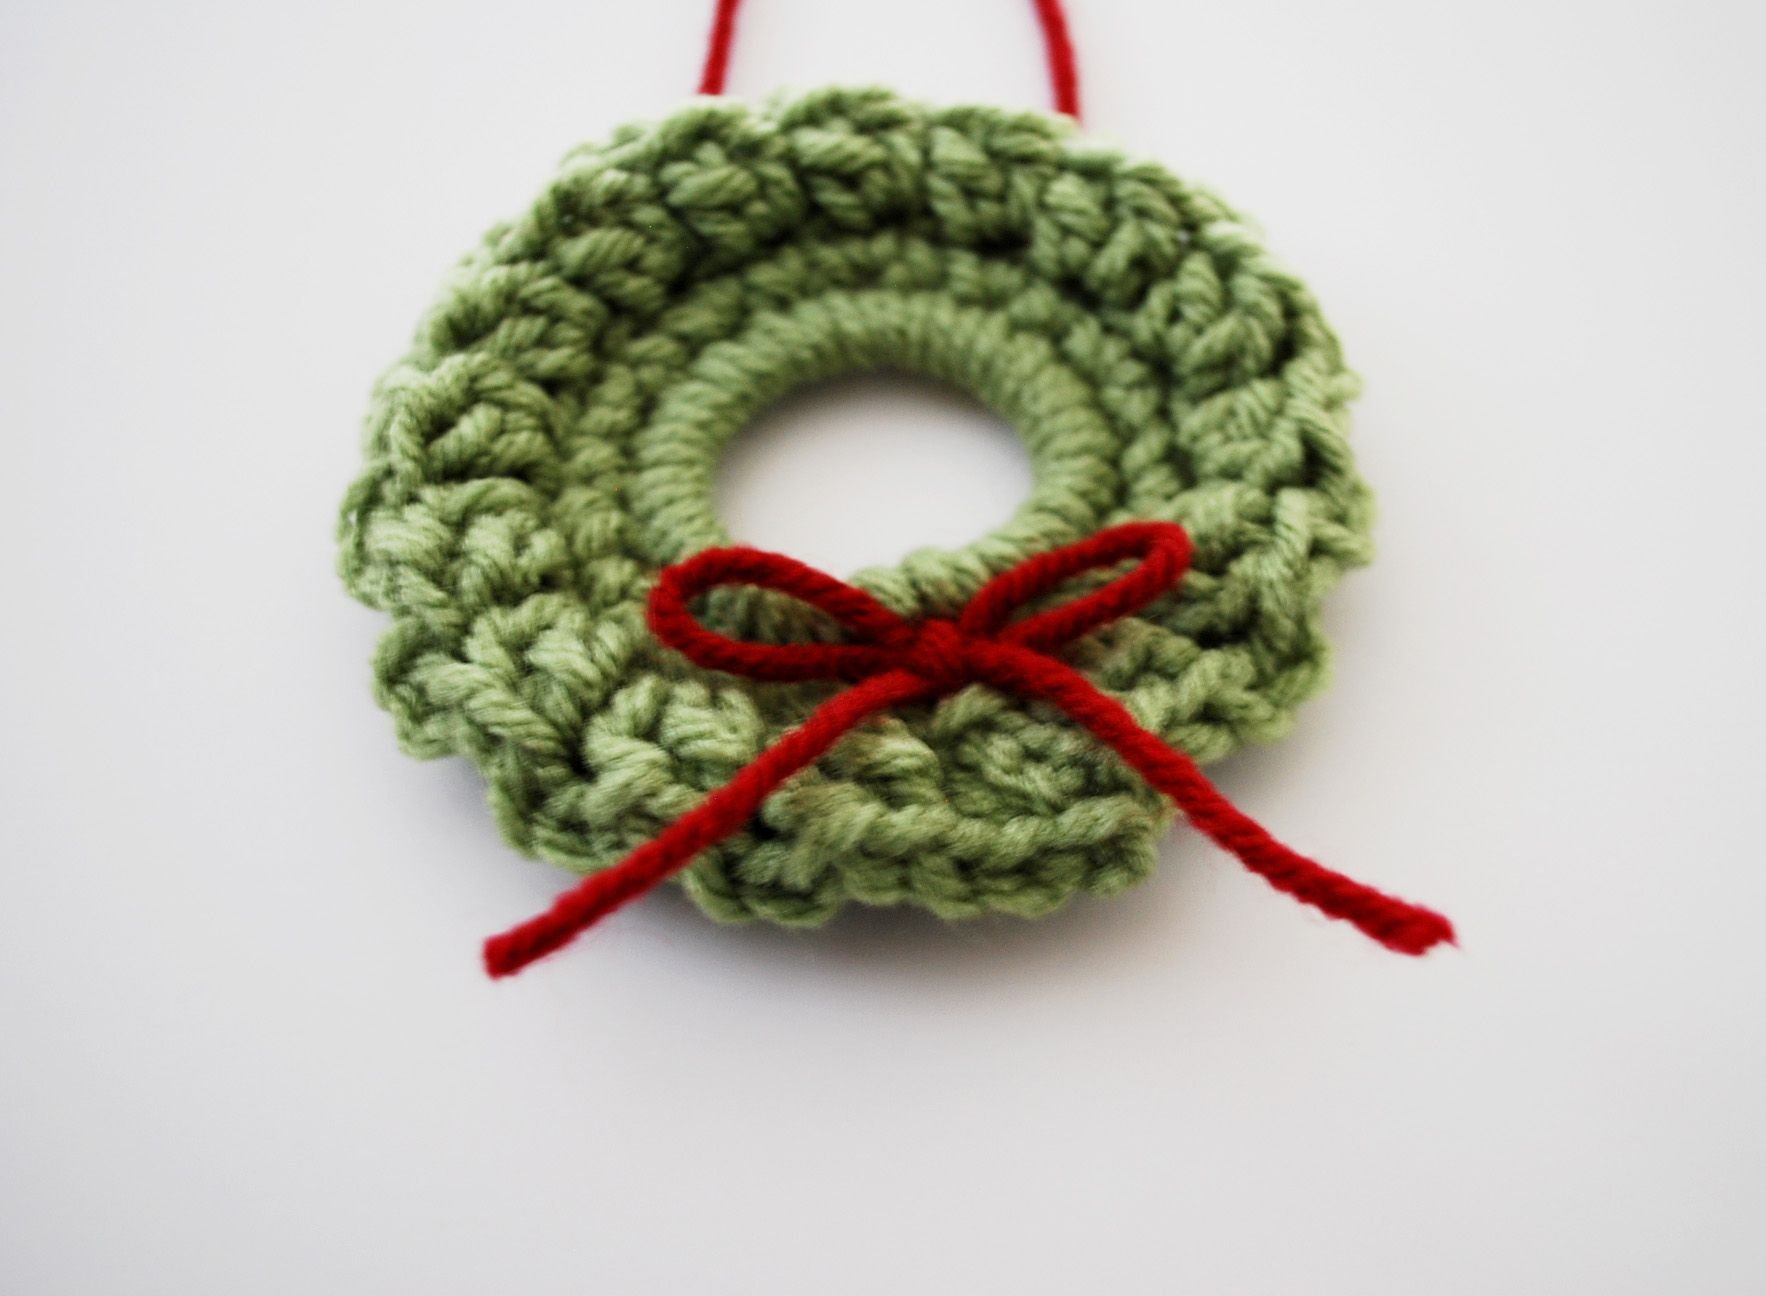 Mini Crochet Wreath | Pinterest | Wreaths, Ornament and Scrap